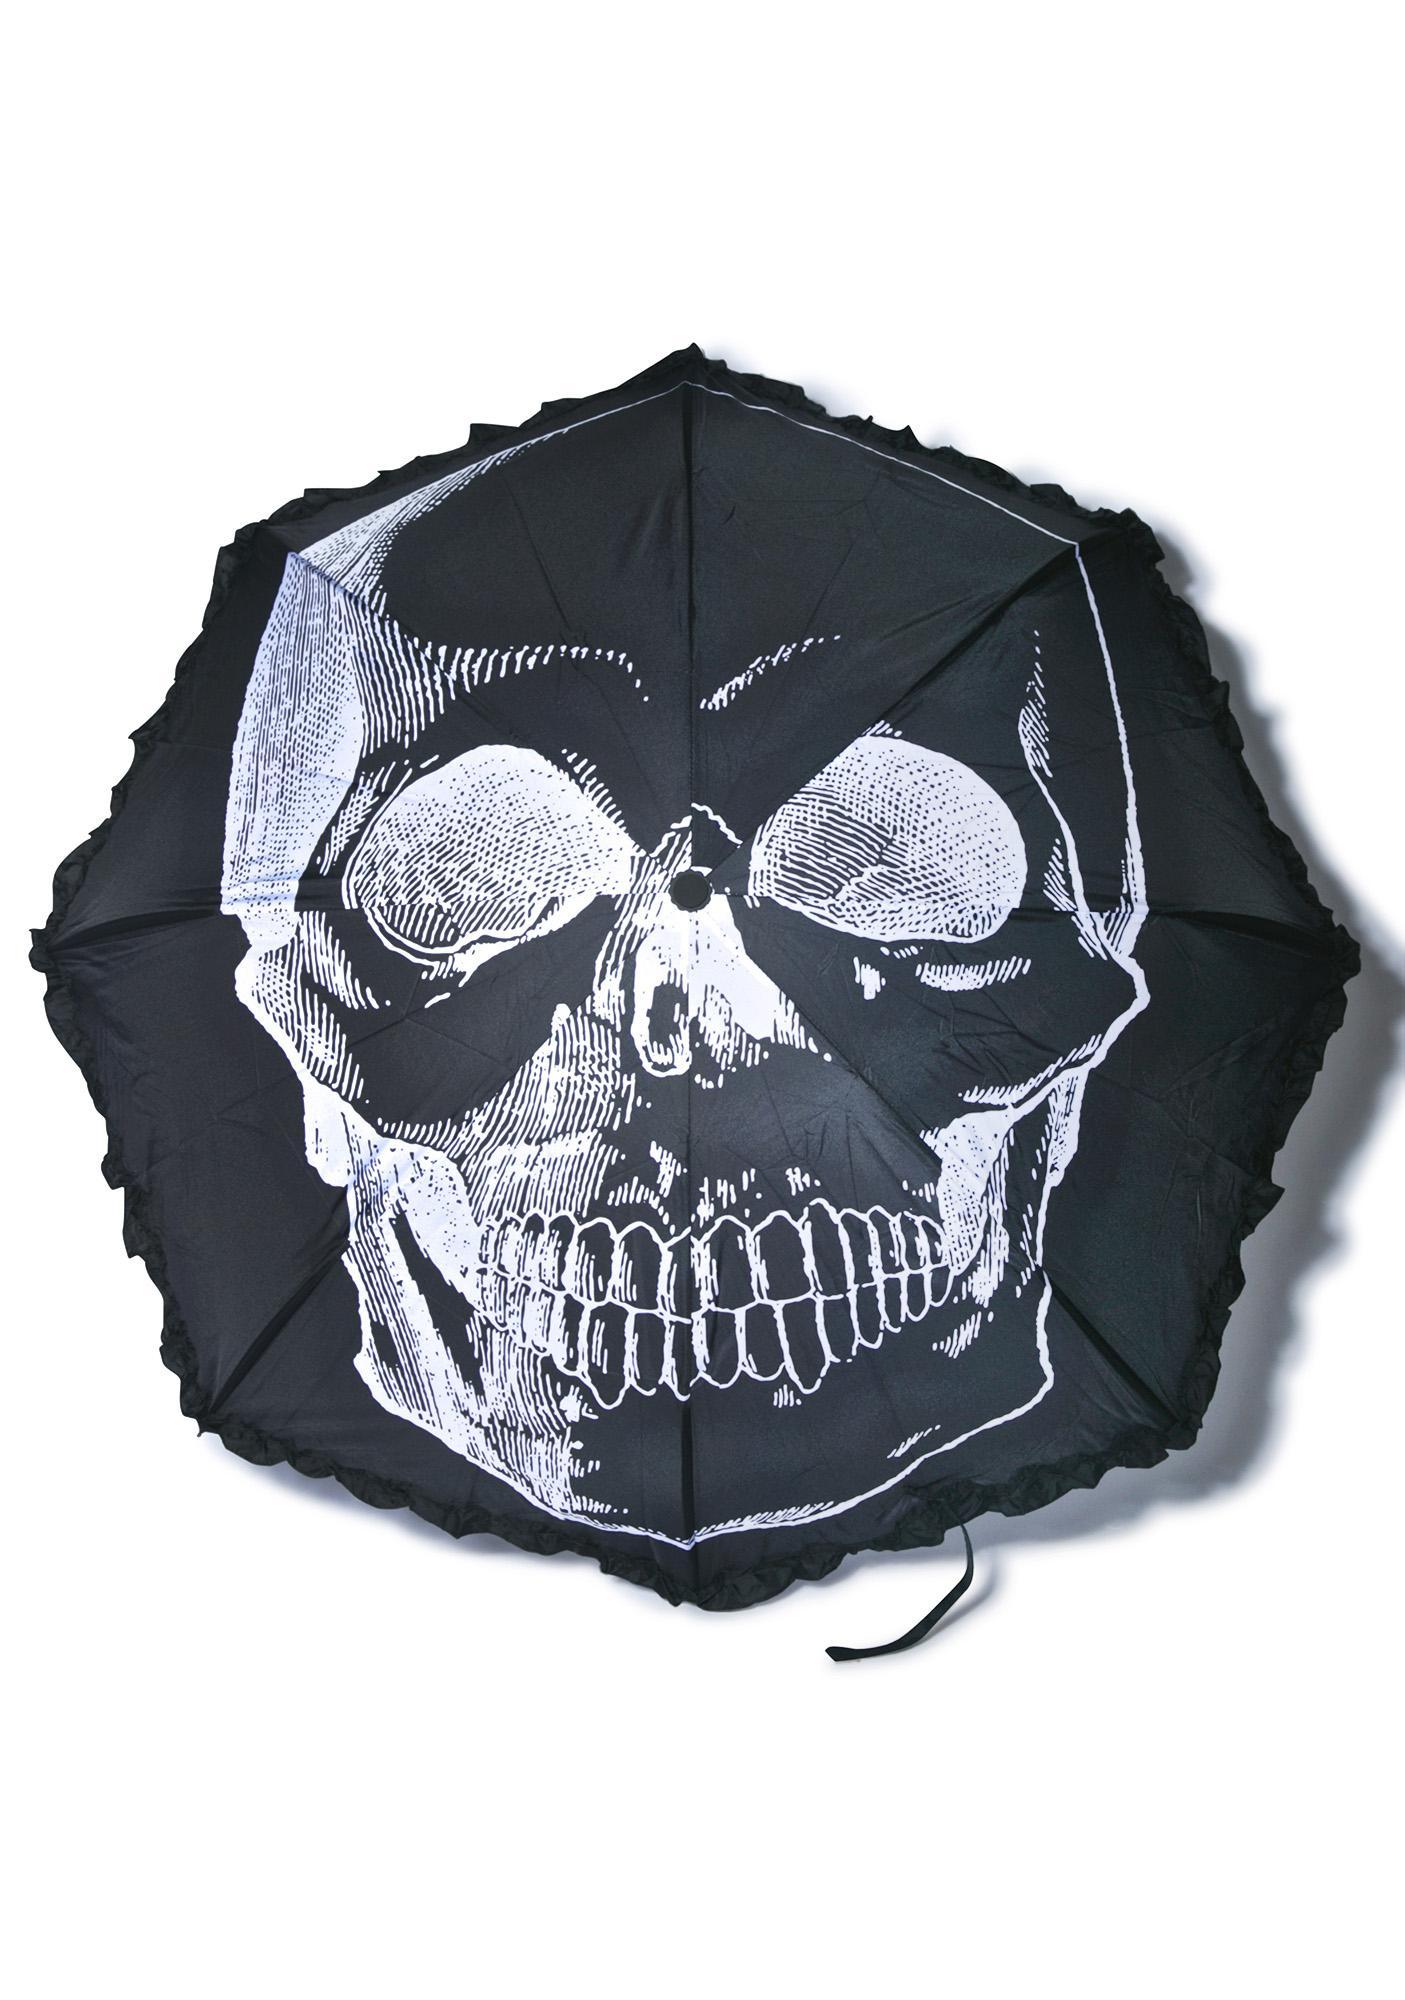 Sourpuss Clothing Skull Umbrella